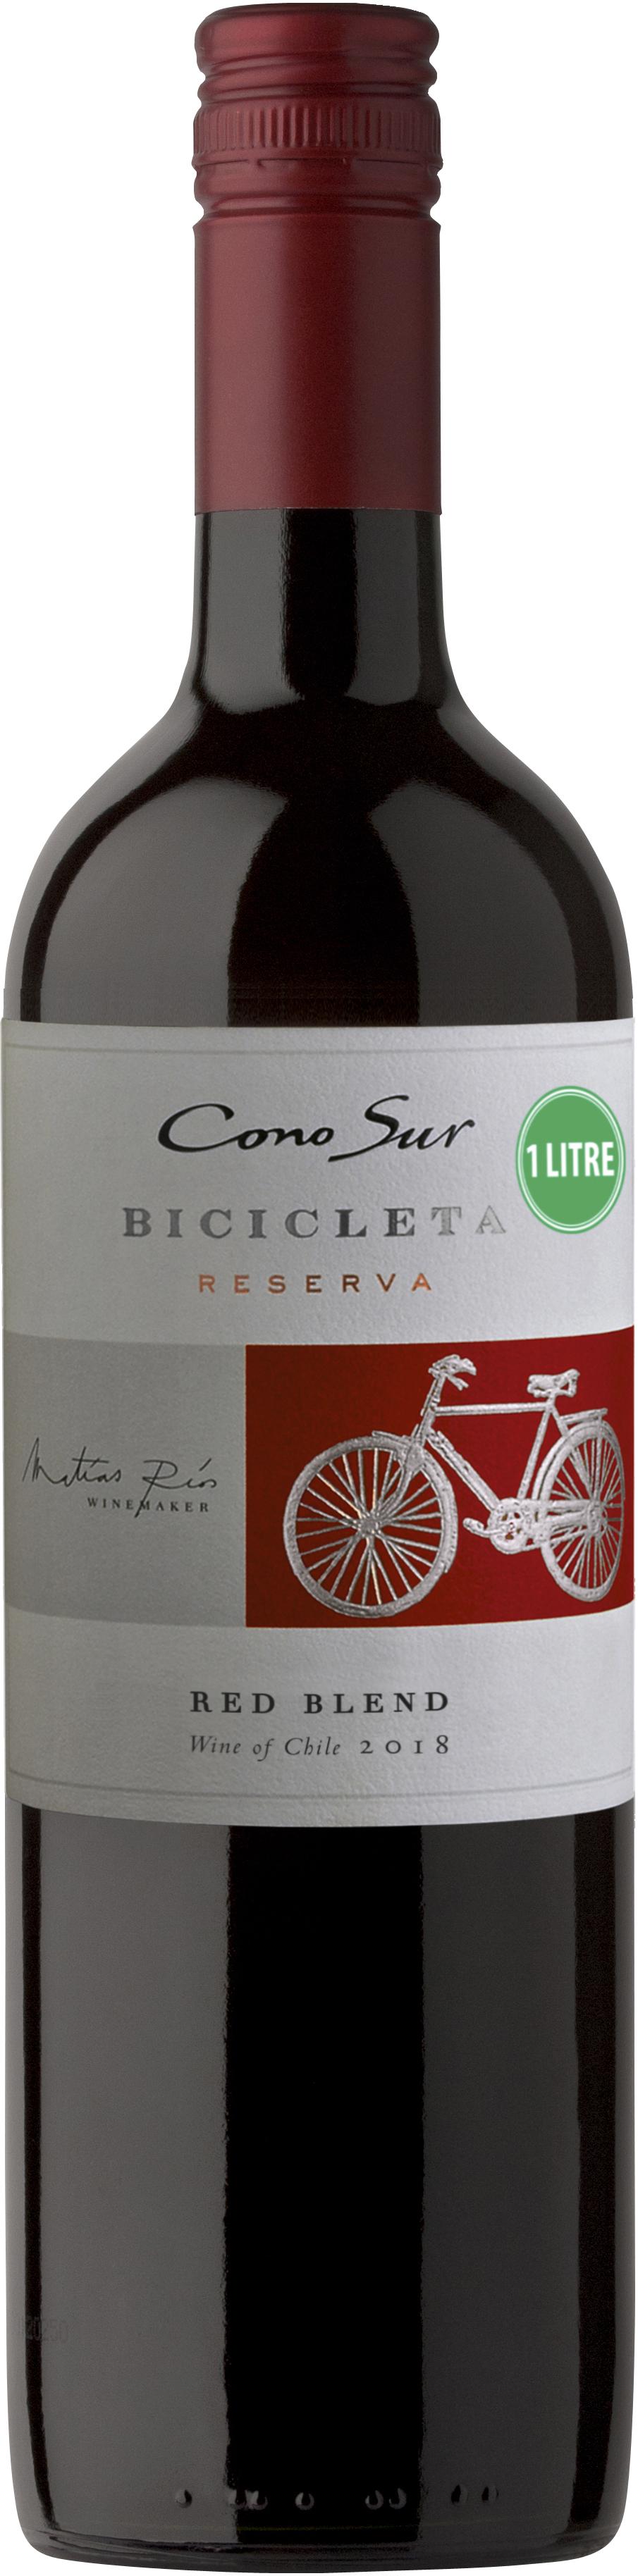 Cono Sur Bicicleta Red Blend 1000ml